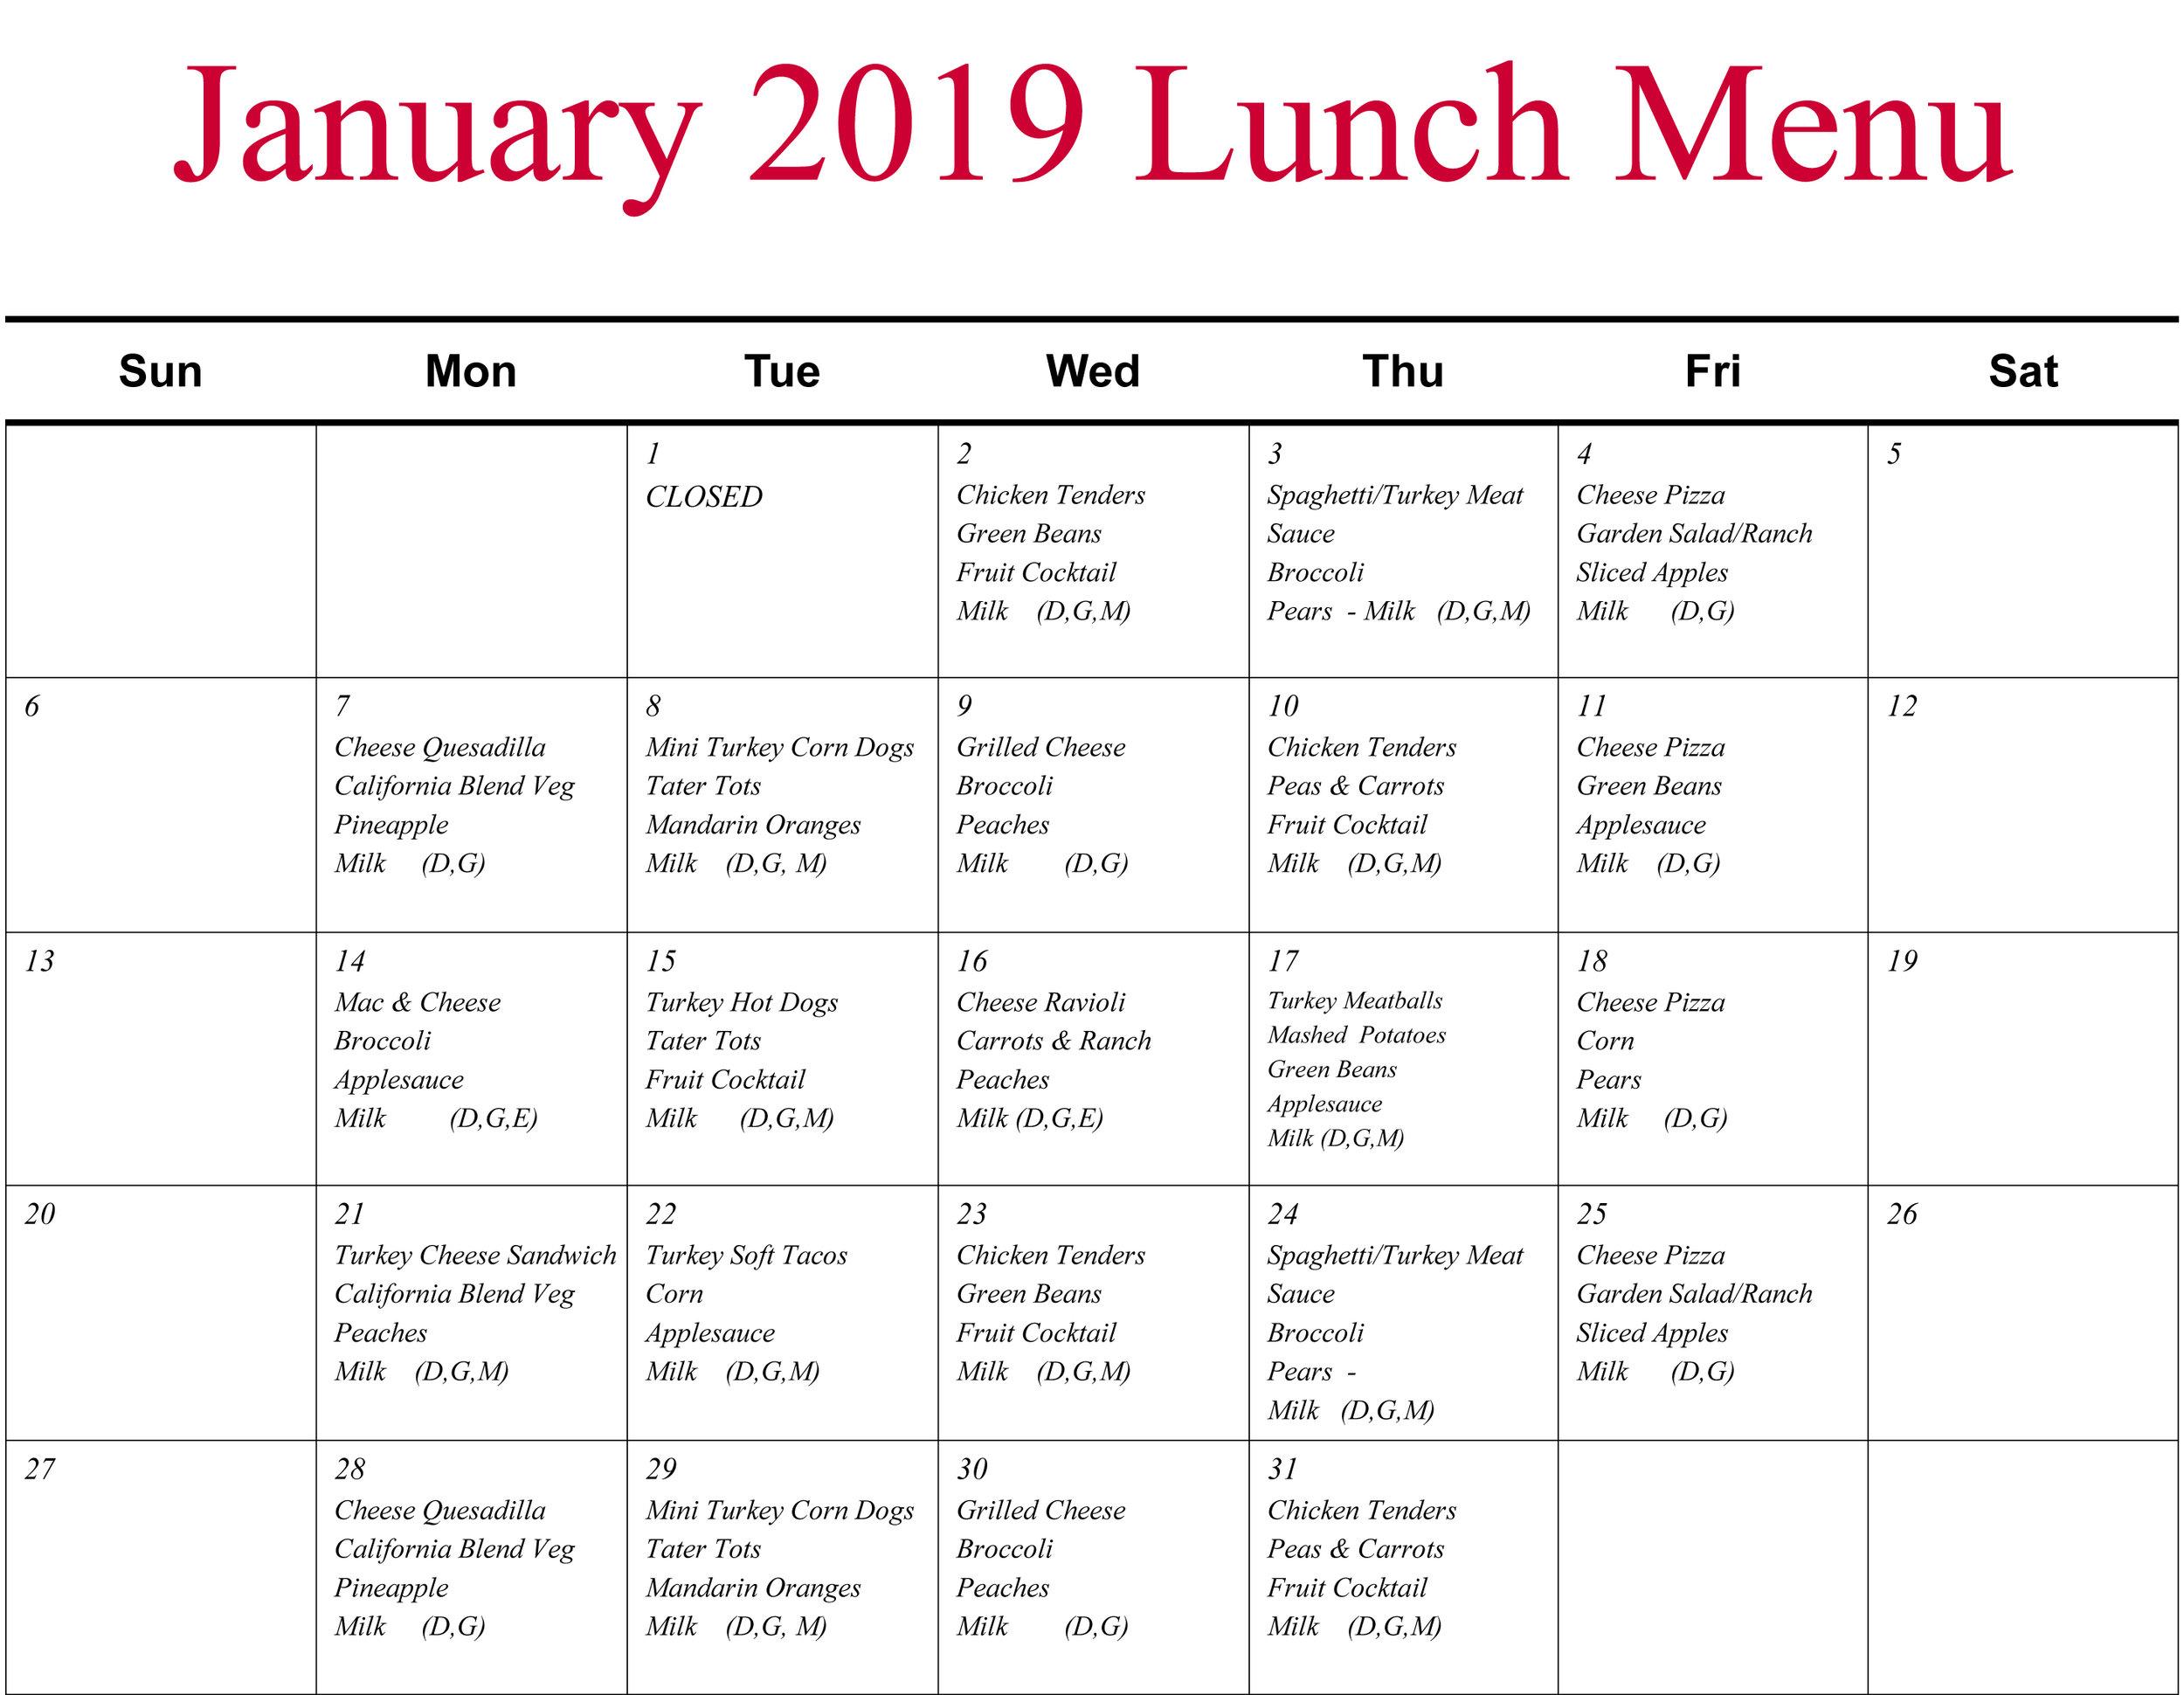 January 2019 Lunch Menu.jpg